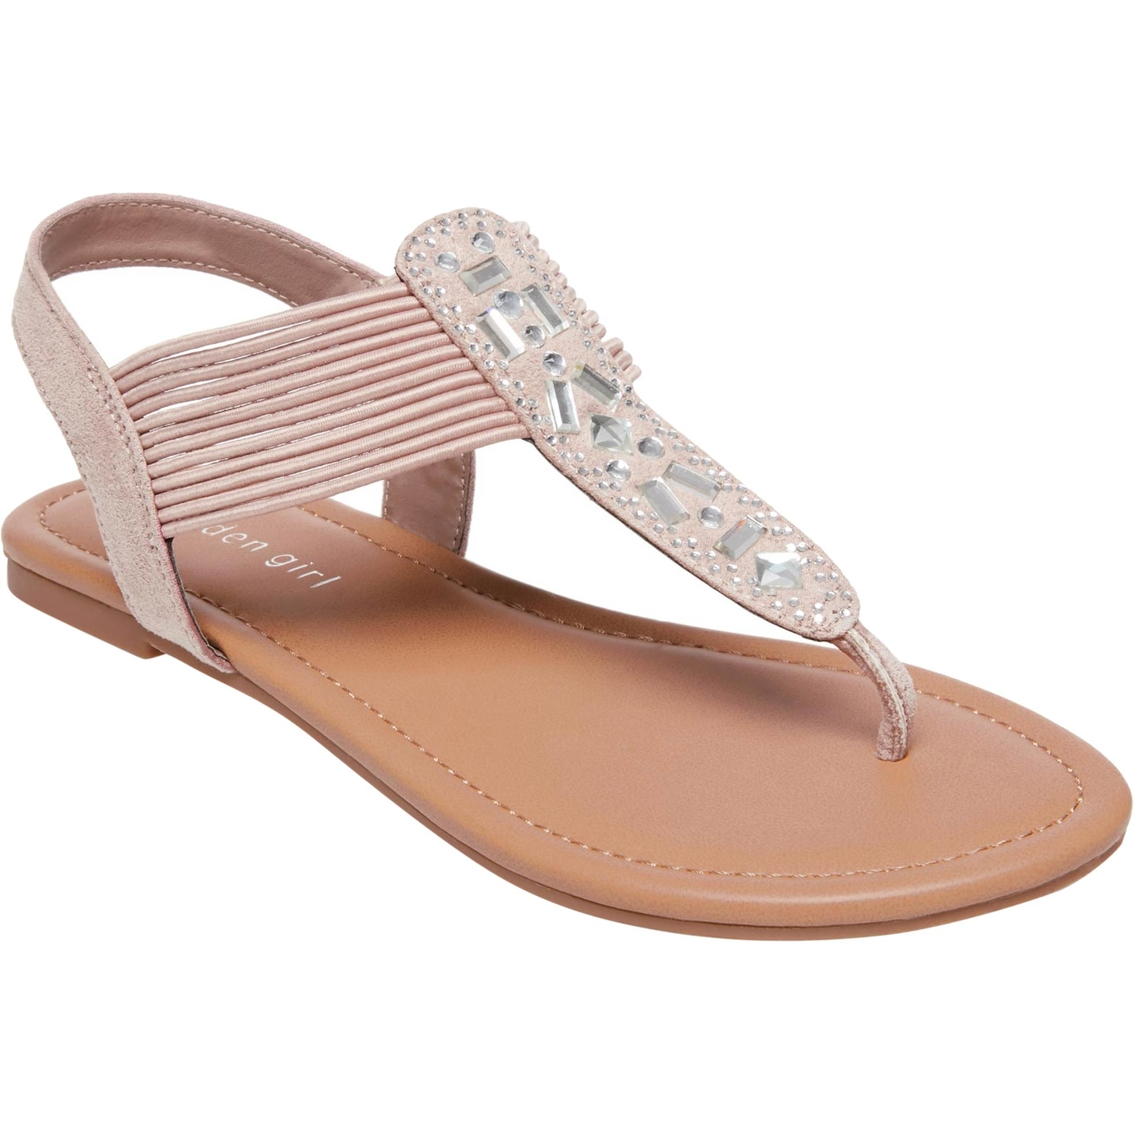 4c643c931 Madden Girl Tanna Jeweled Thong Sandal